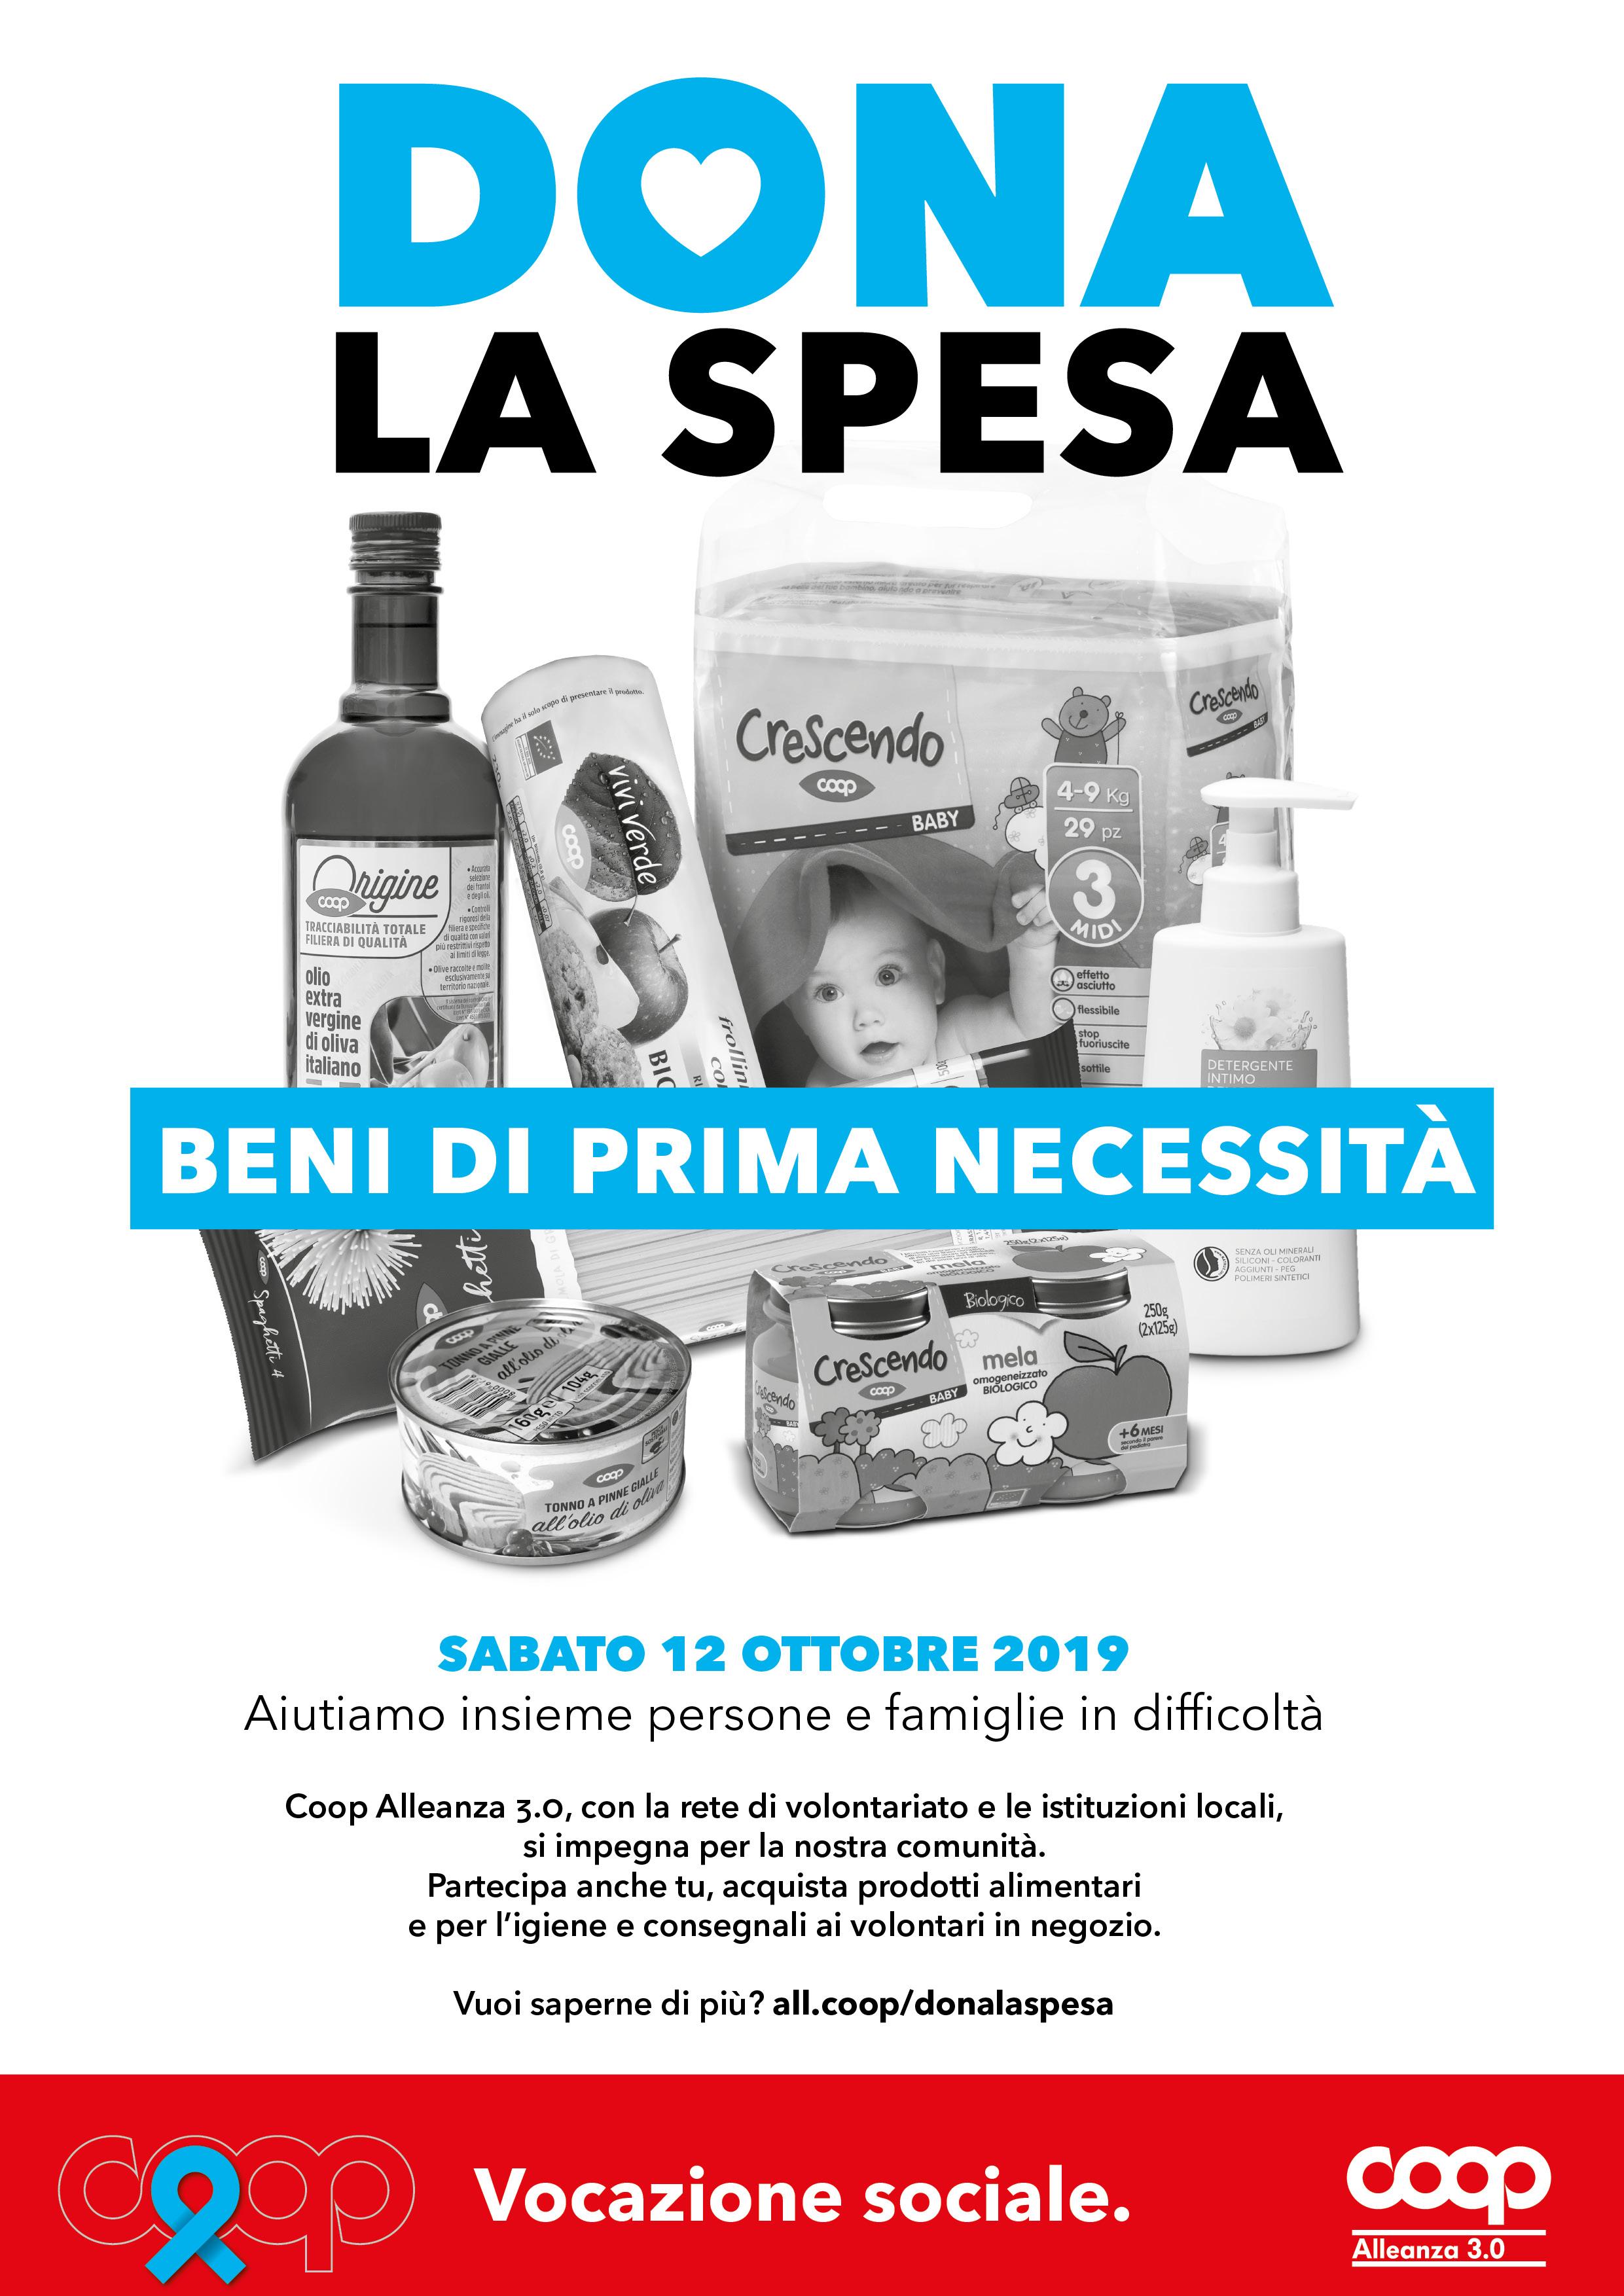 dona-la-spesa-12-ottobre